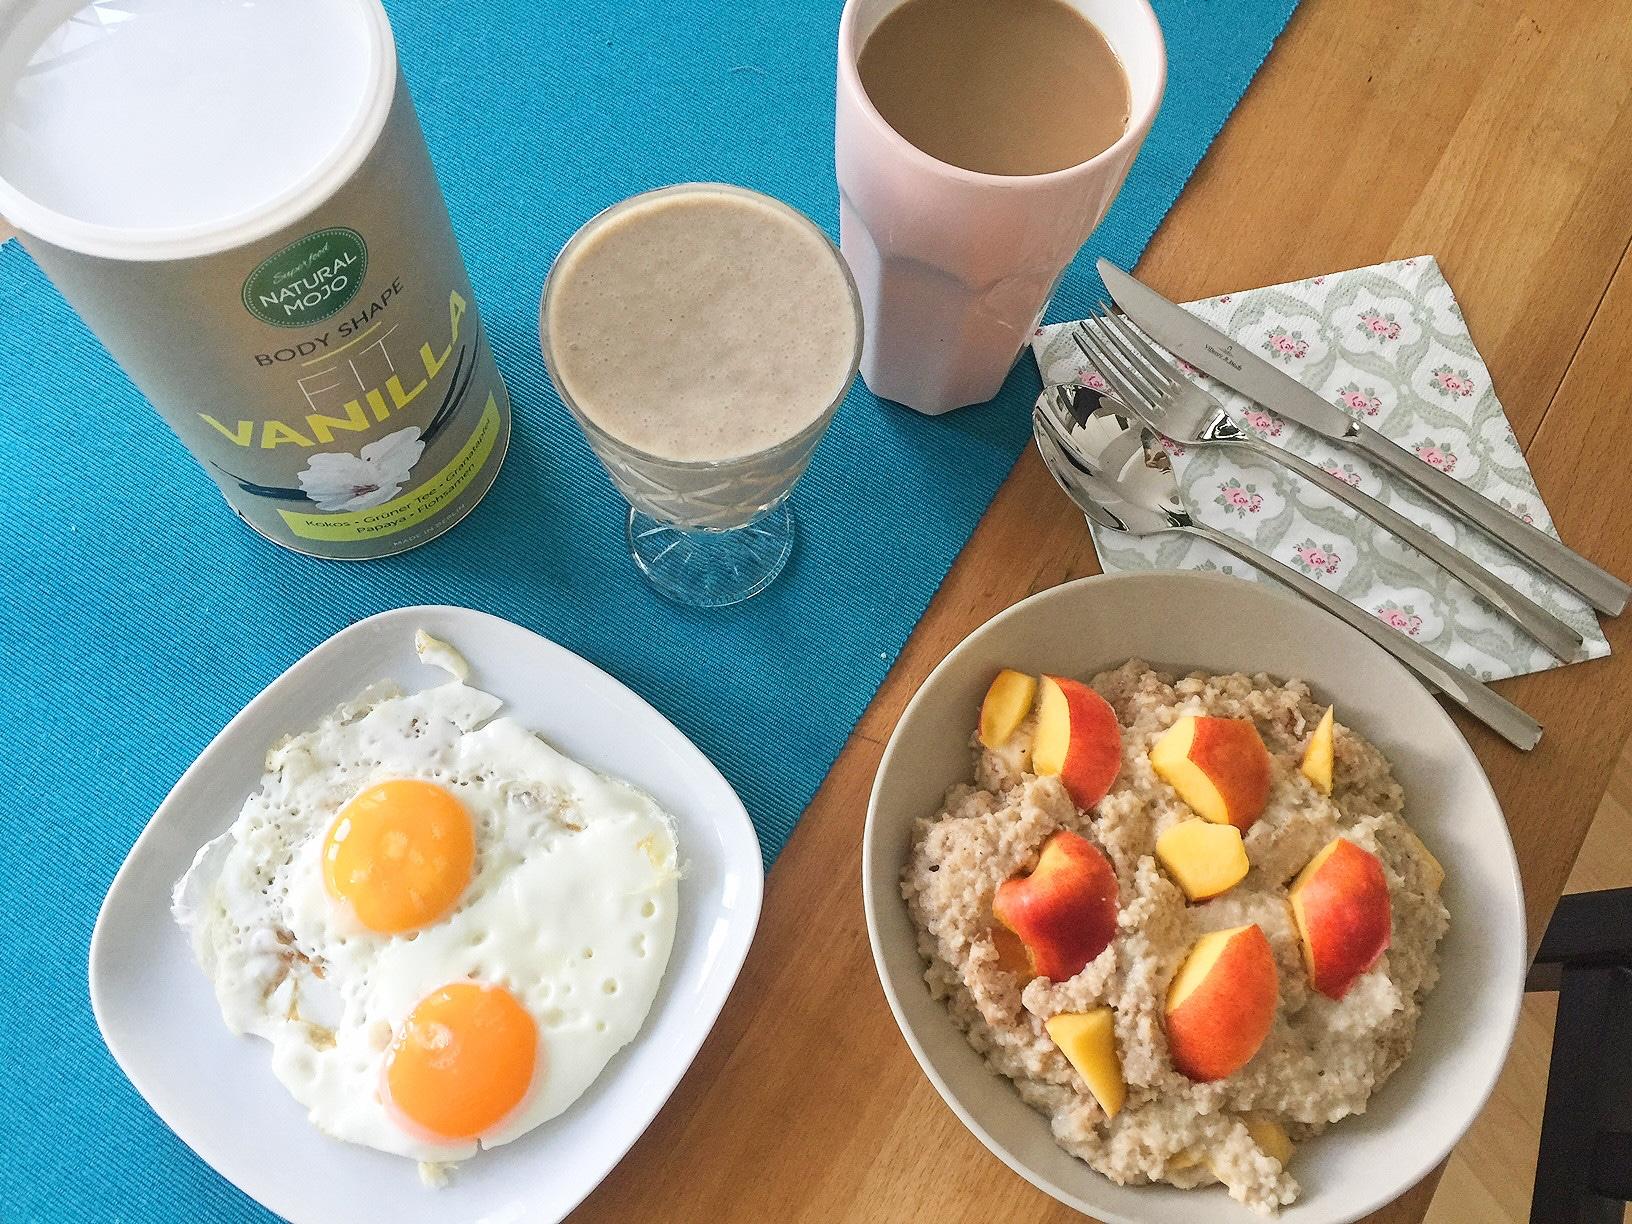 Leckeres Natural Mojo Fitness Frühstück (Fit Vanille)